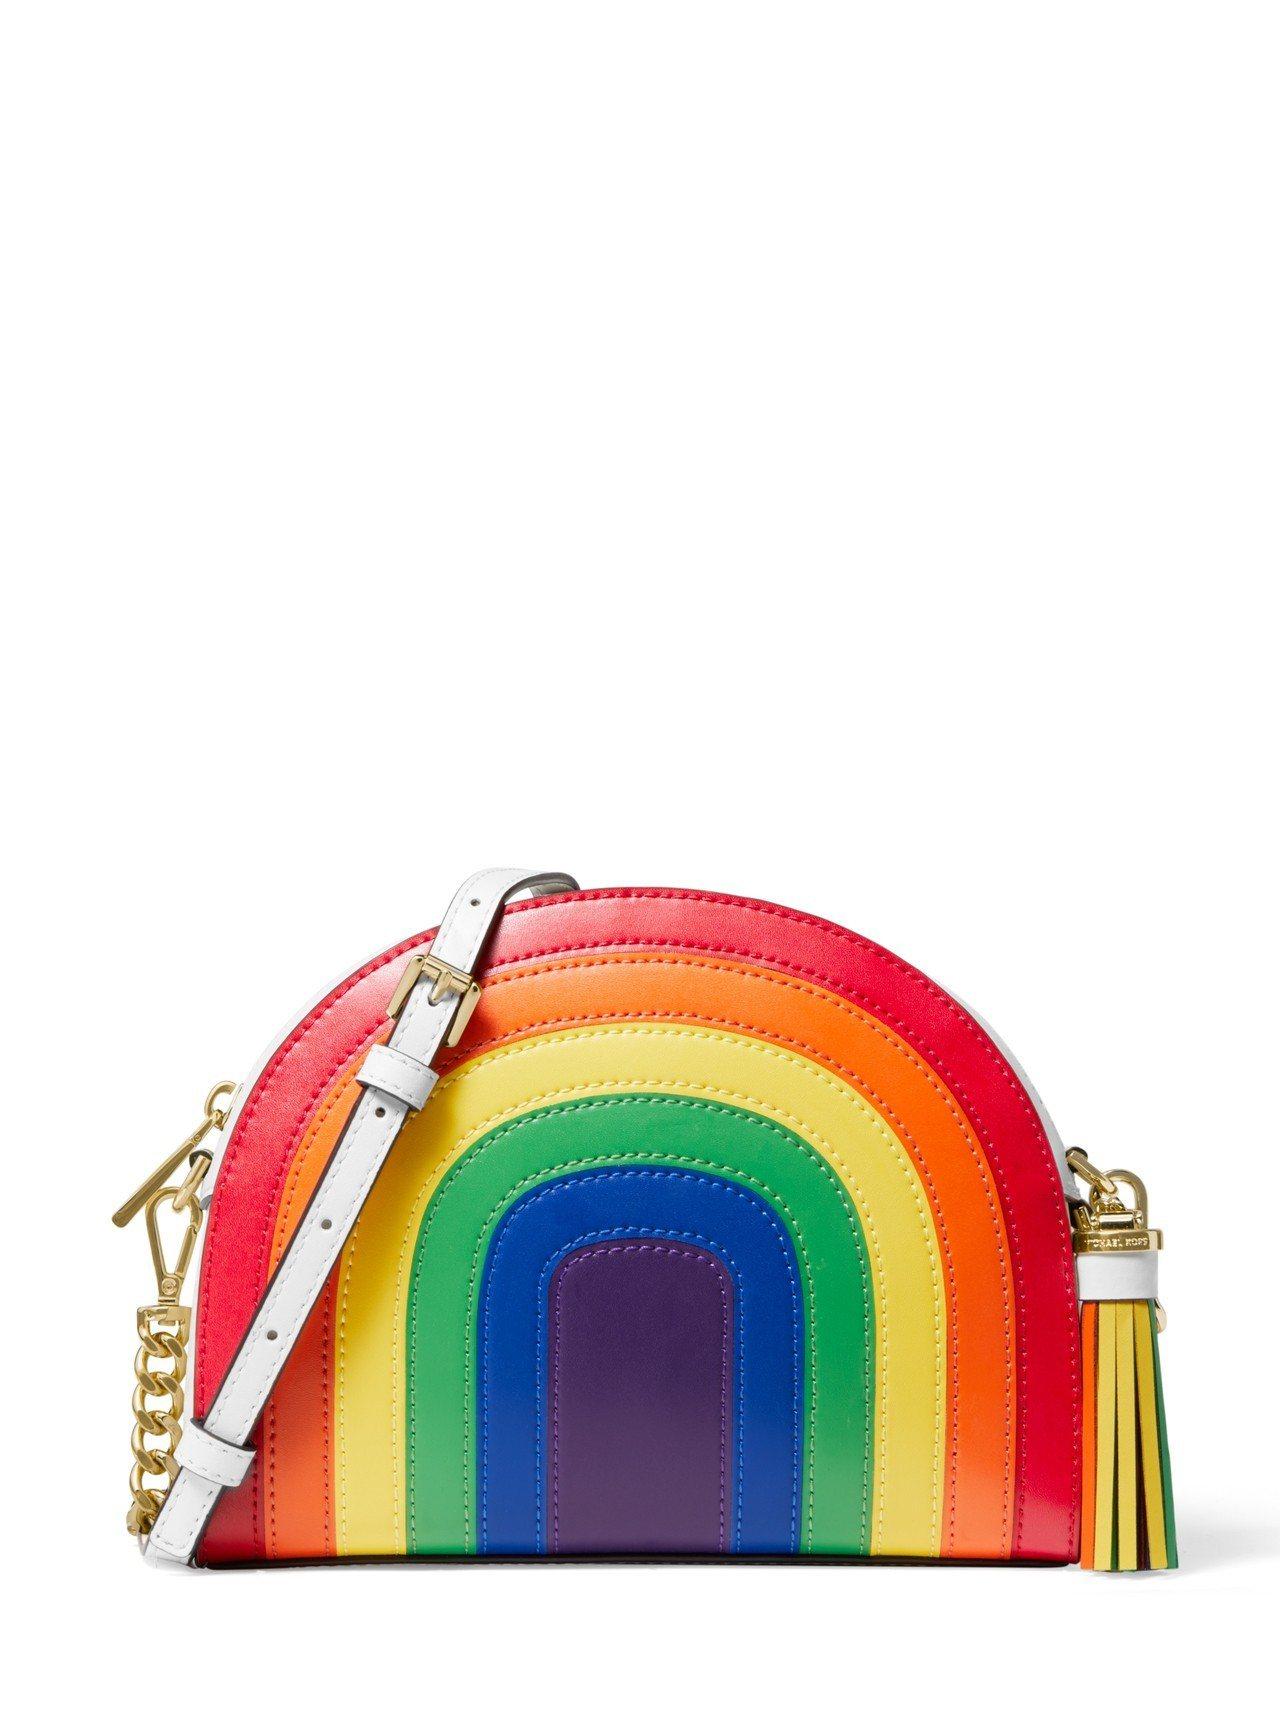 MMK彩虹系列肩包,售價10,900元。圖/MICHAEL KORS提供